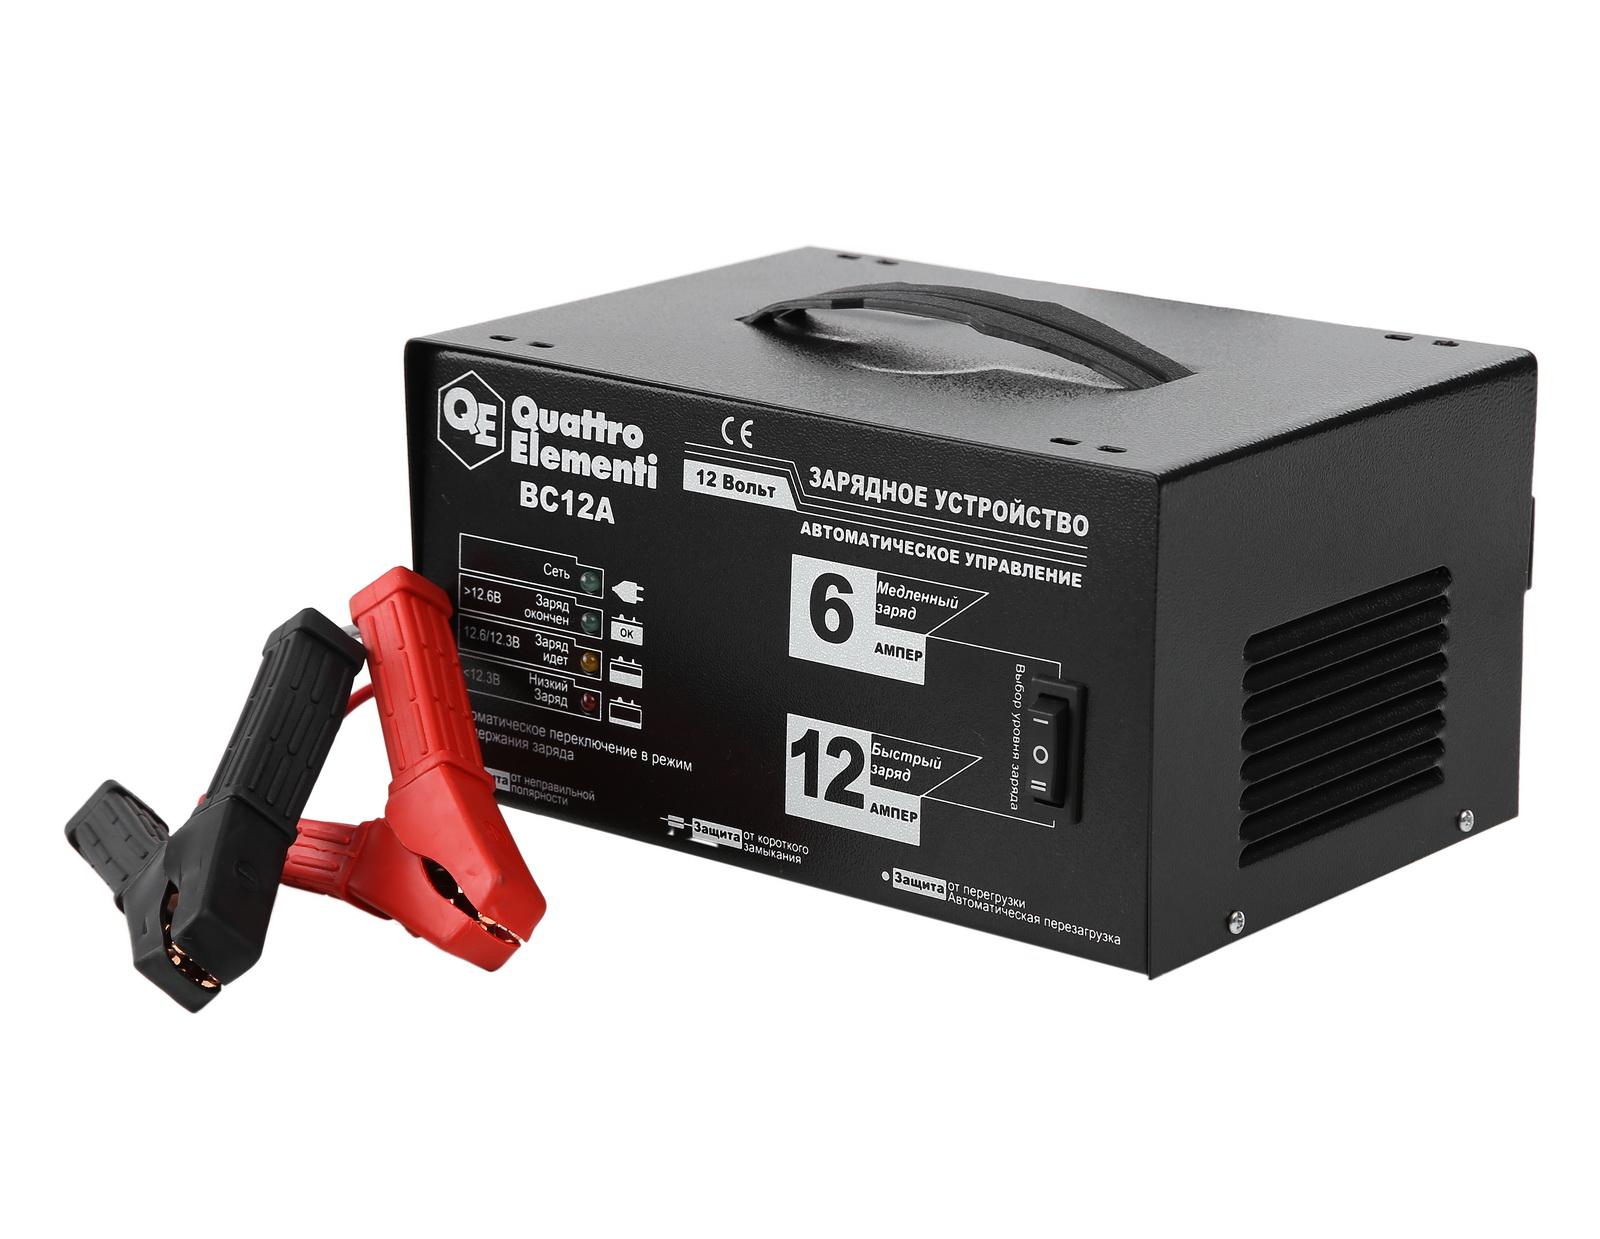 Купить со скидкой Устройство зарядное Quattro elementi 770-131bc 12a